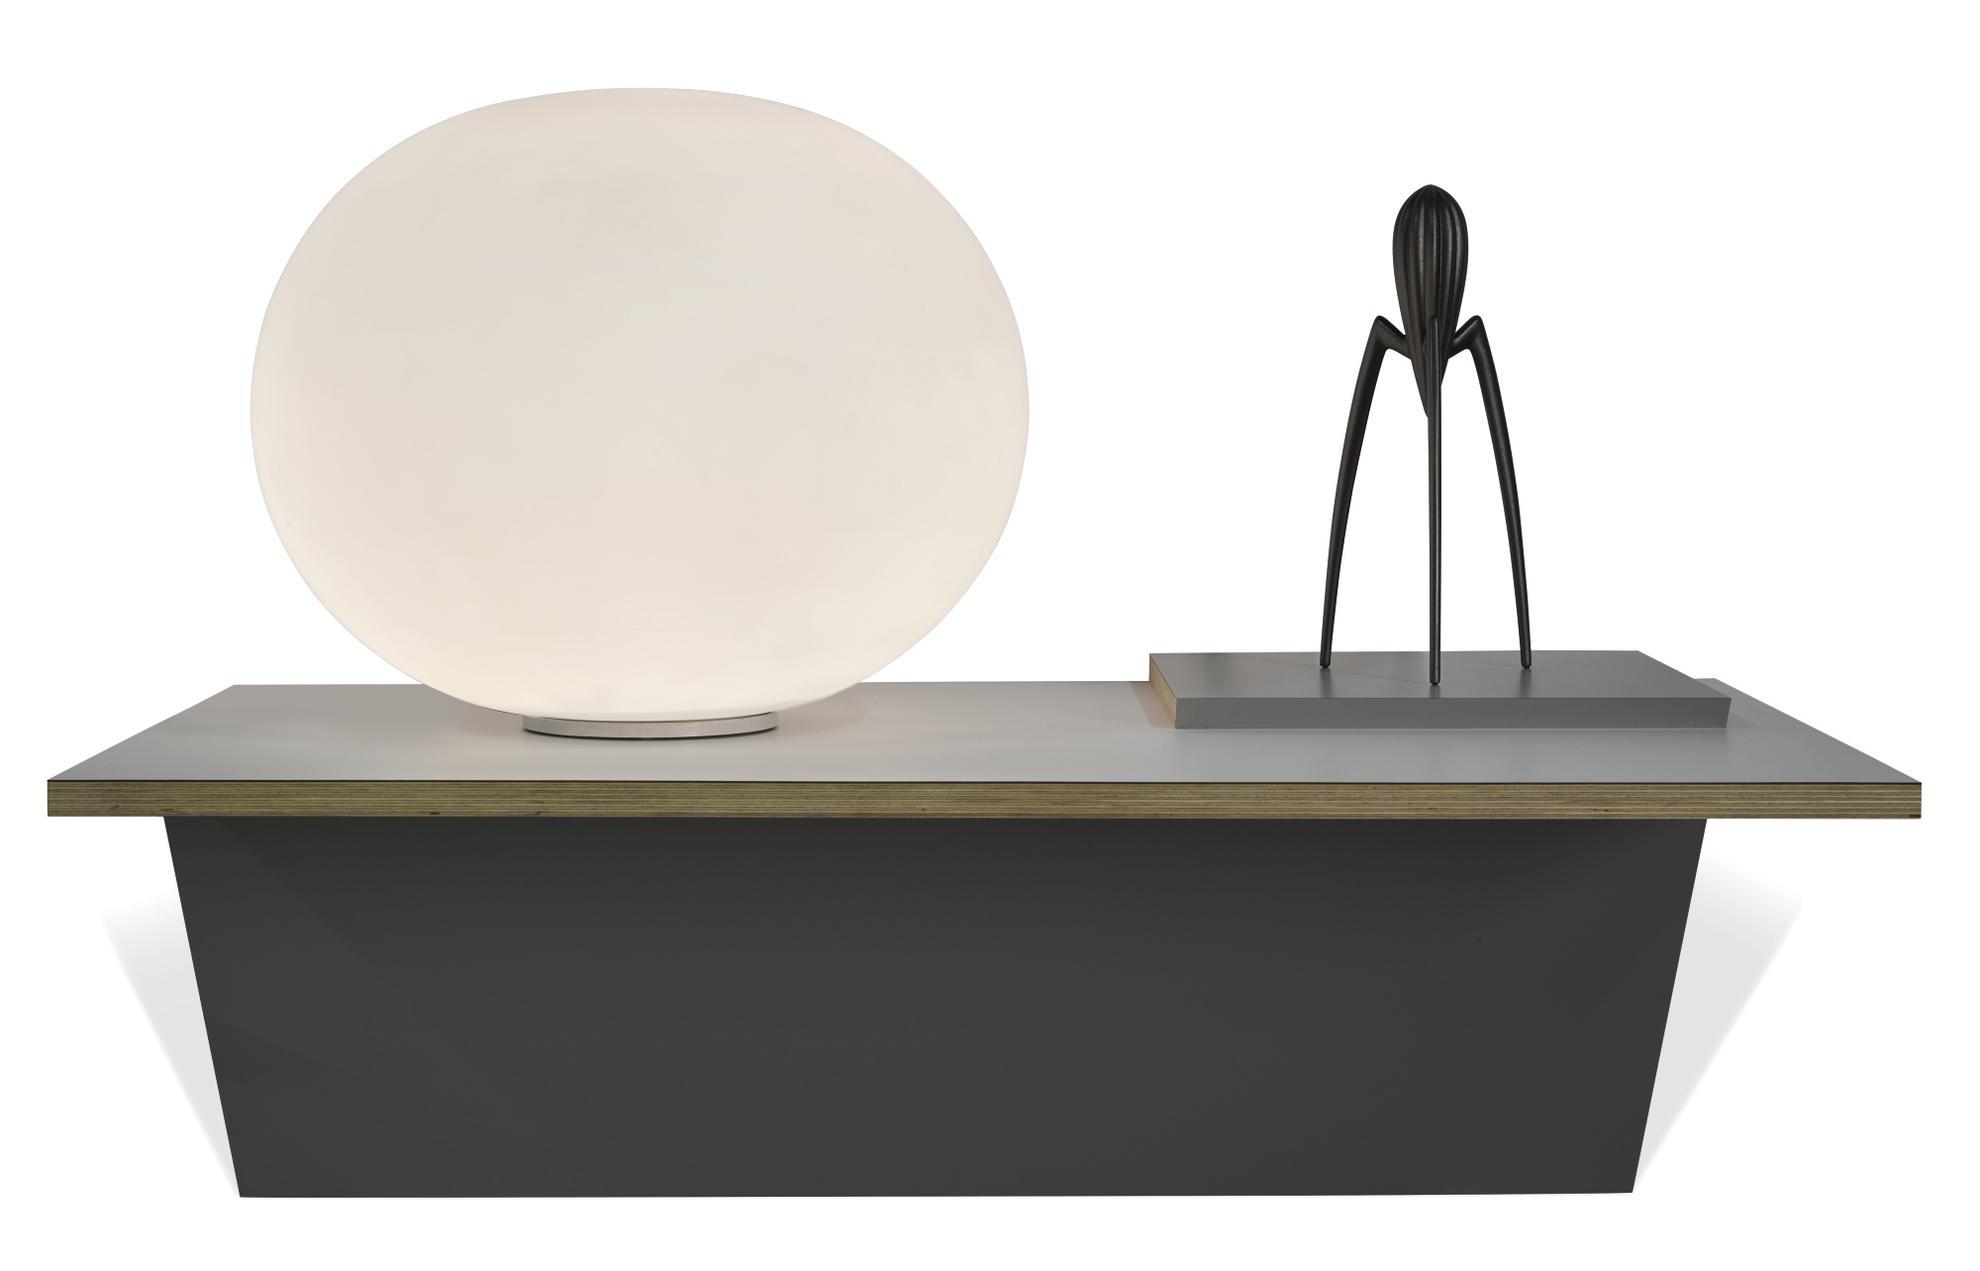 Haim Steinbach-Untitled (Lamp, Juicer)-2001